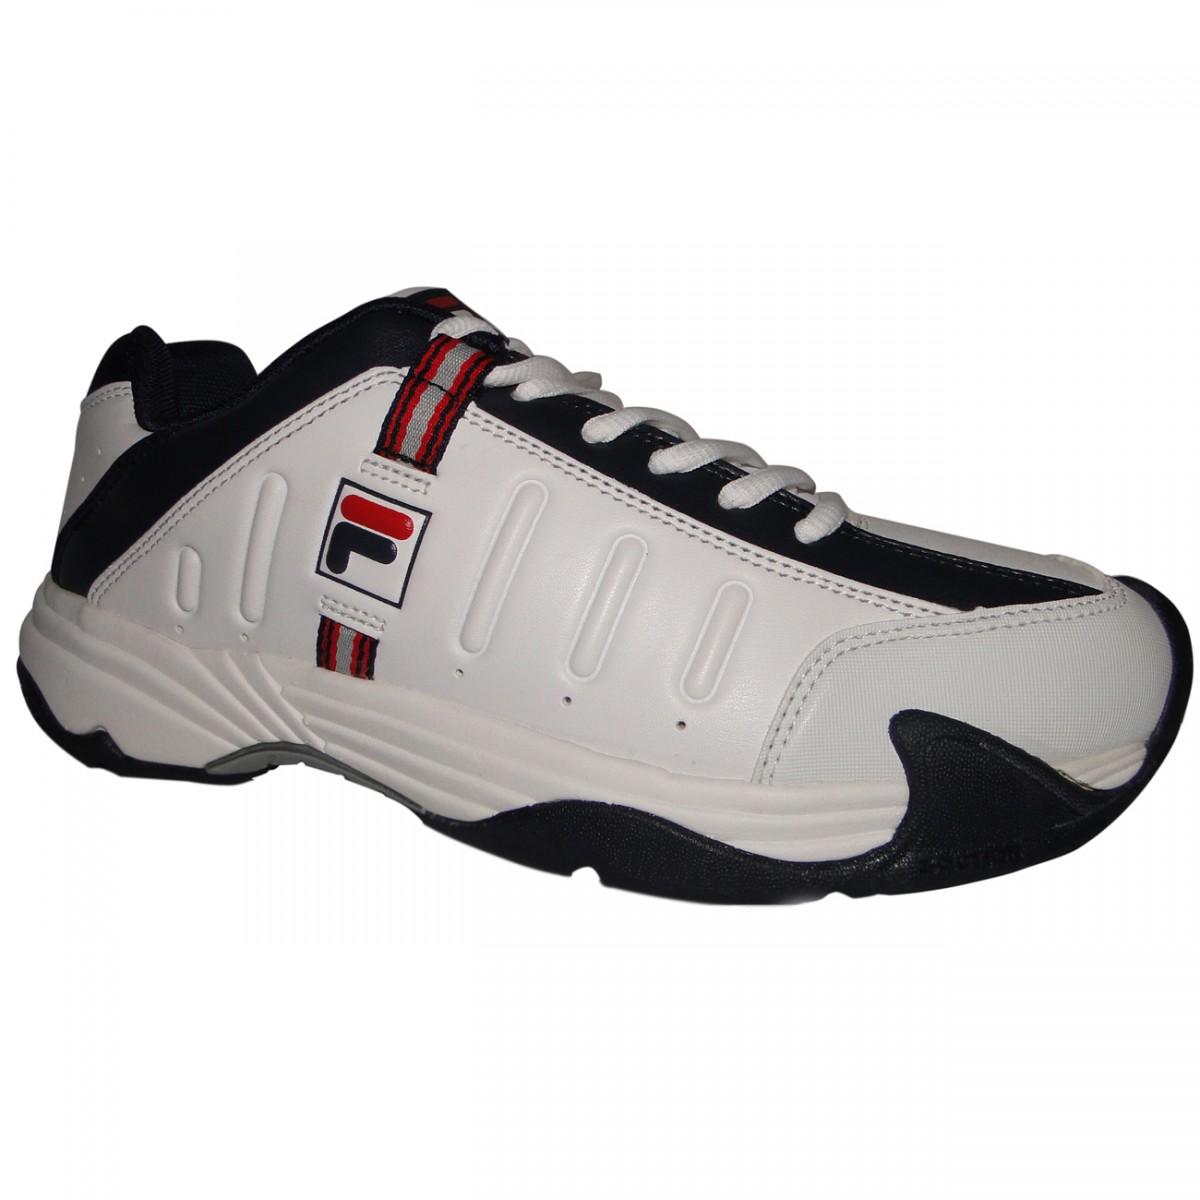 cef24341b80 Tênis Fila Axilus Ii 8989 - BRANCO MARINHO - Chuteira Nike